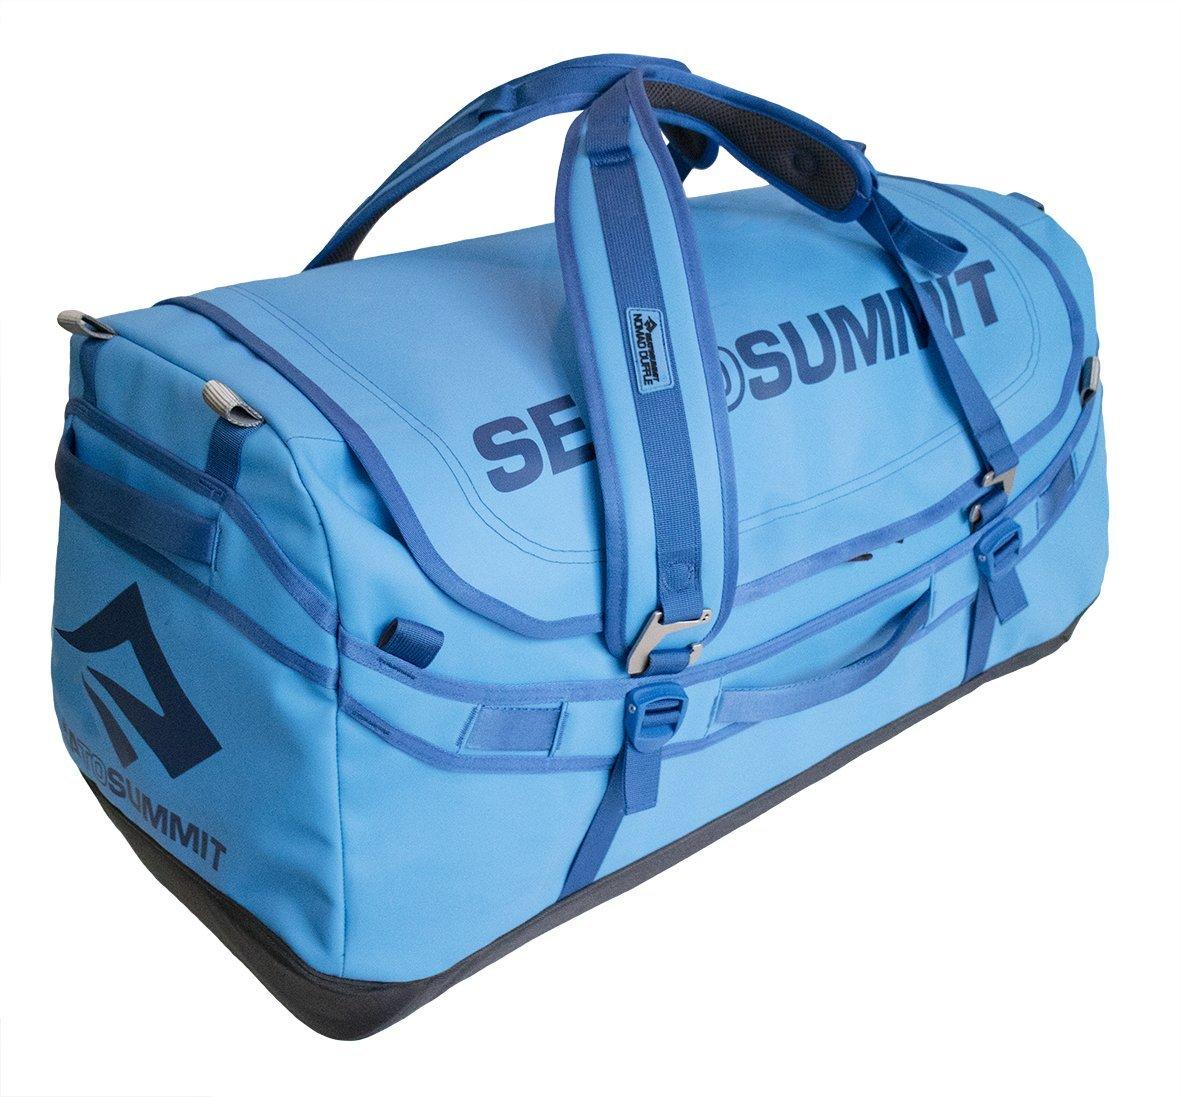 3fb49fd158 Amazon.com  Sea to Summit Duffle Bag  Sports   Outdoors